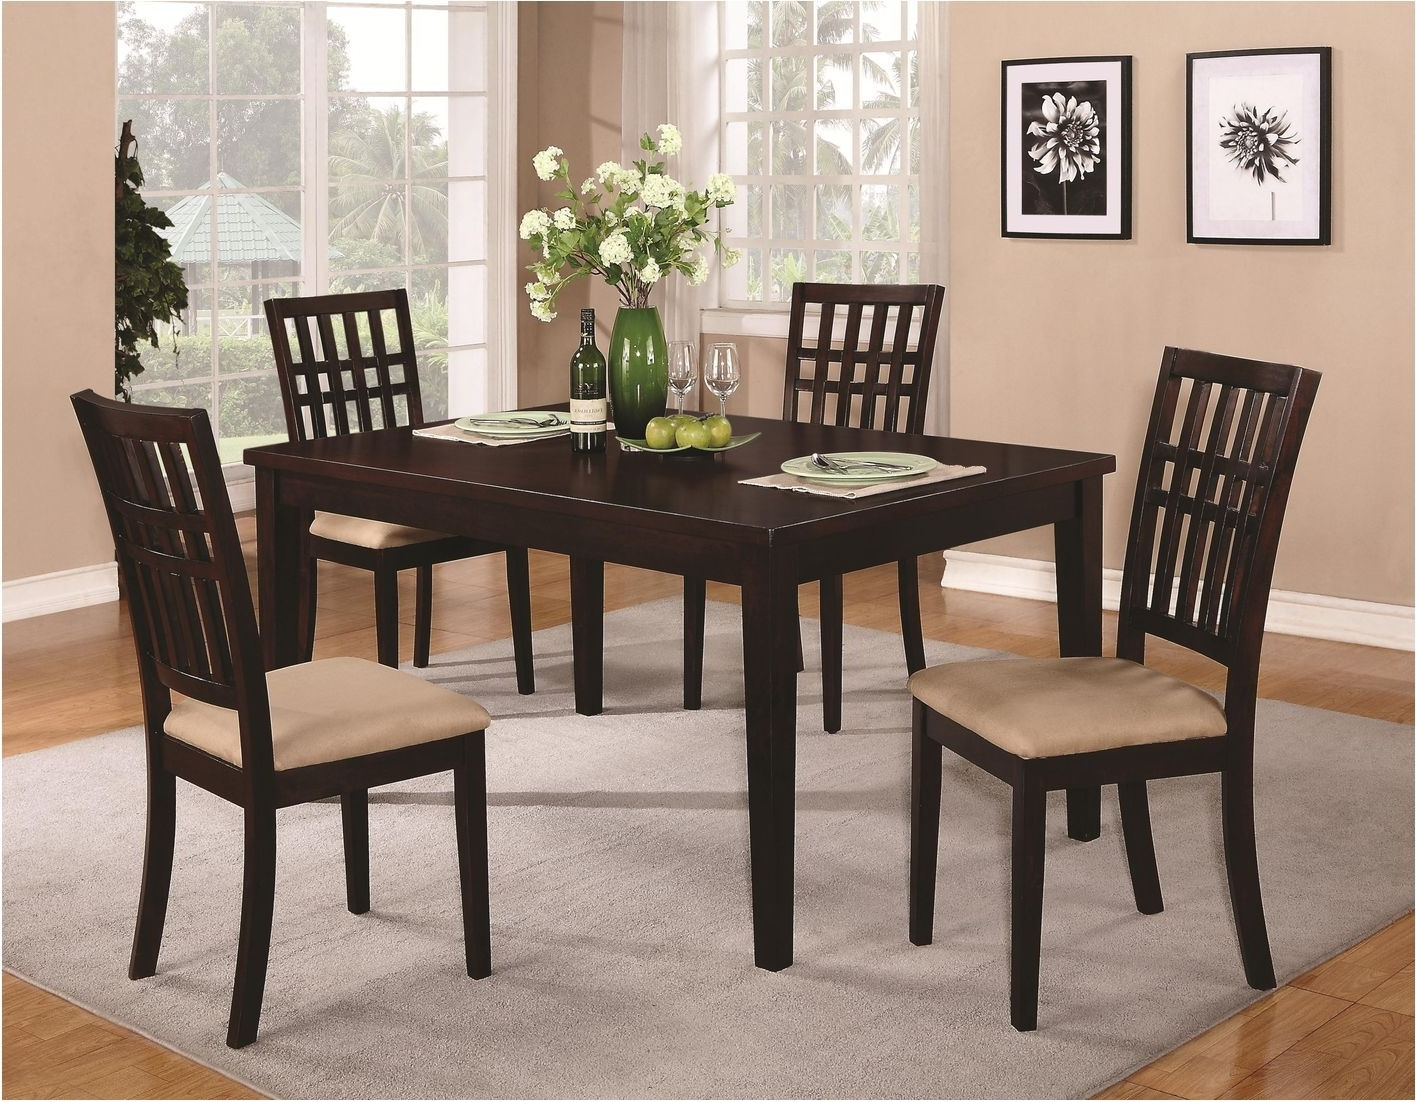 Sensational Large Square Dark Wood Dining Table Glass Legs 6 8 For Latest Dark Wood Dining Tables 6 Chairs (View 22 of 25)